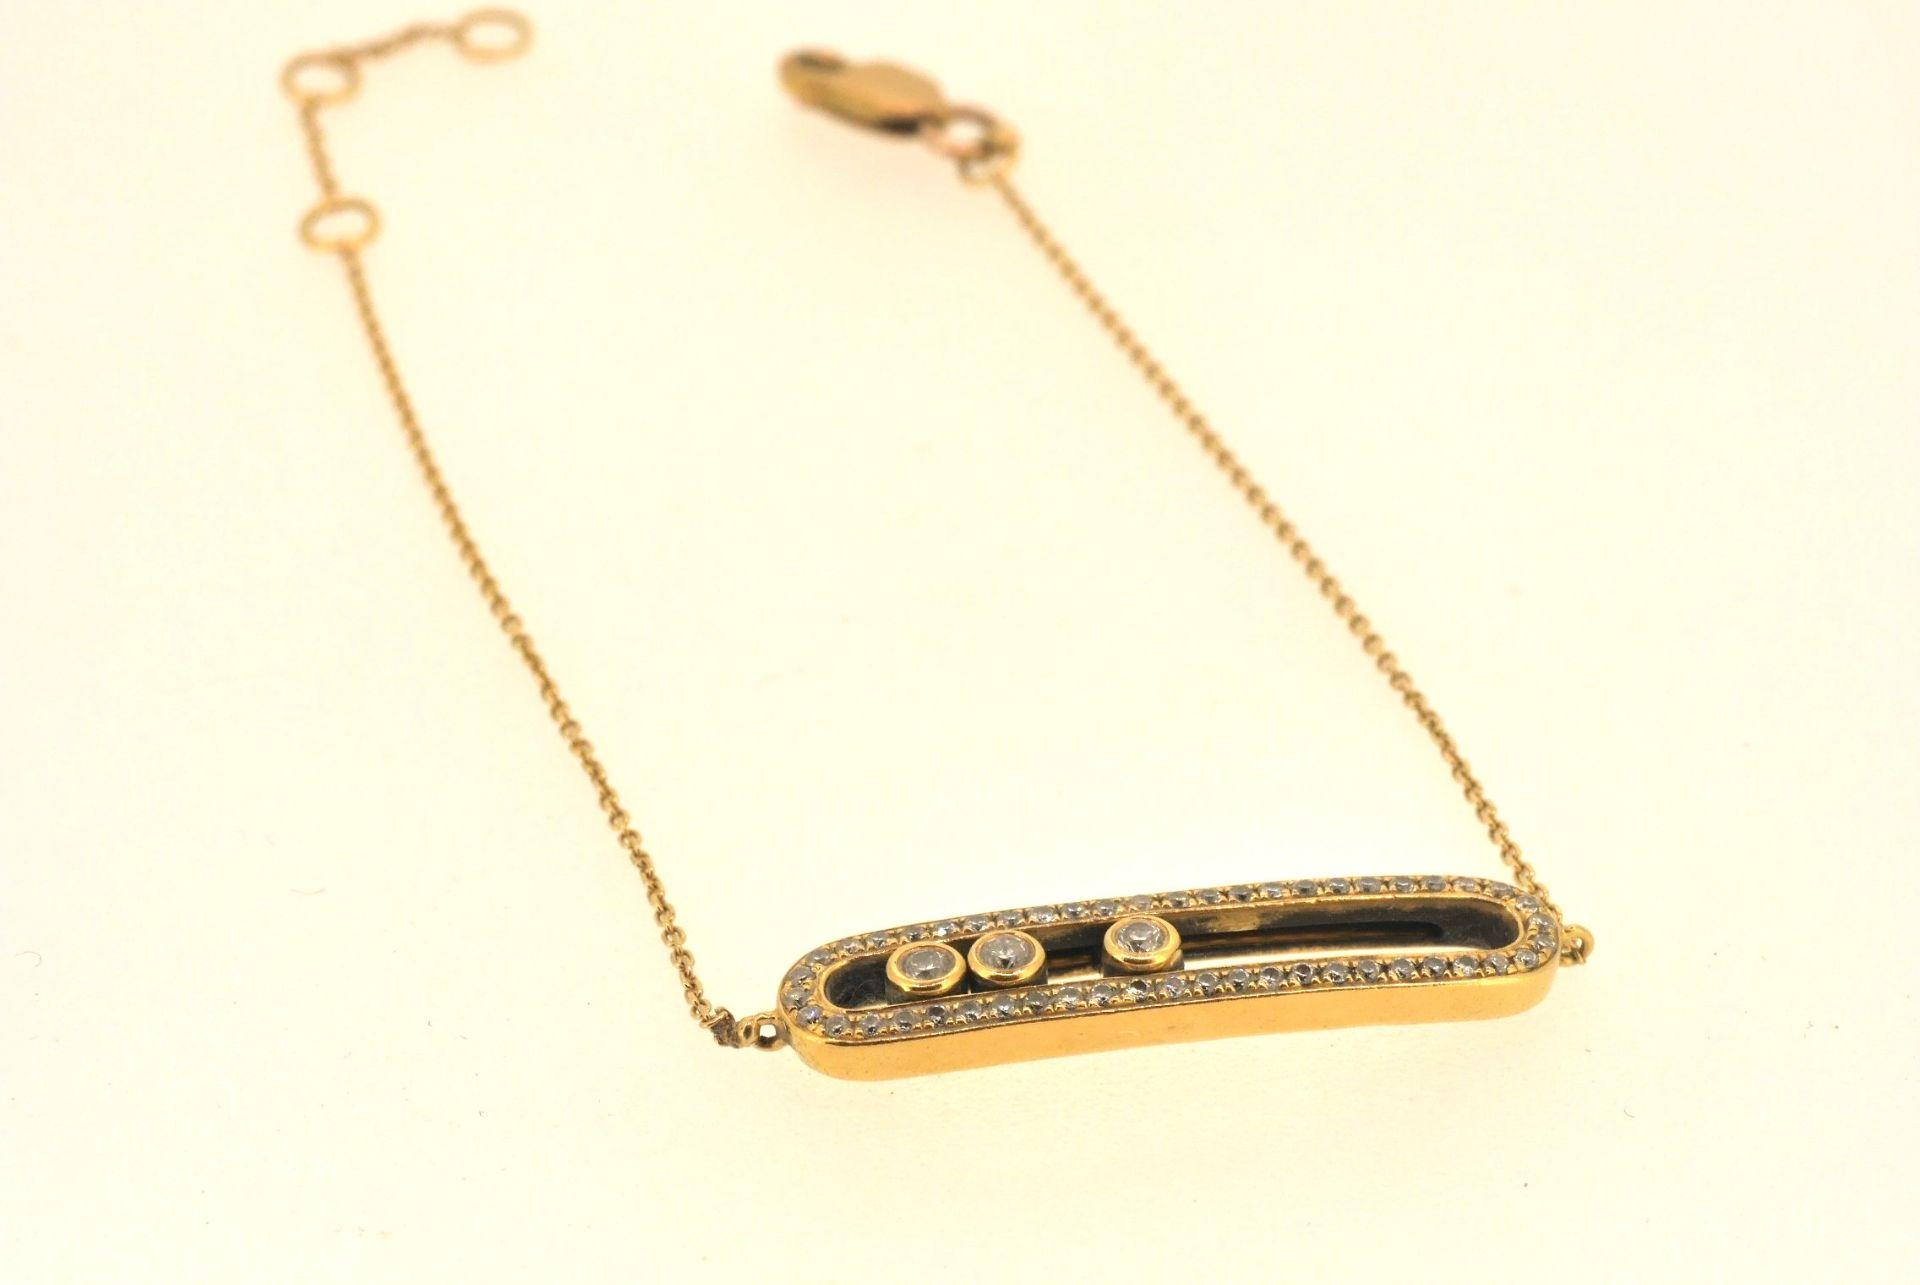 Armband GG 585, Diamanten ca. 0.65 ct, 3,94 Gramm